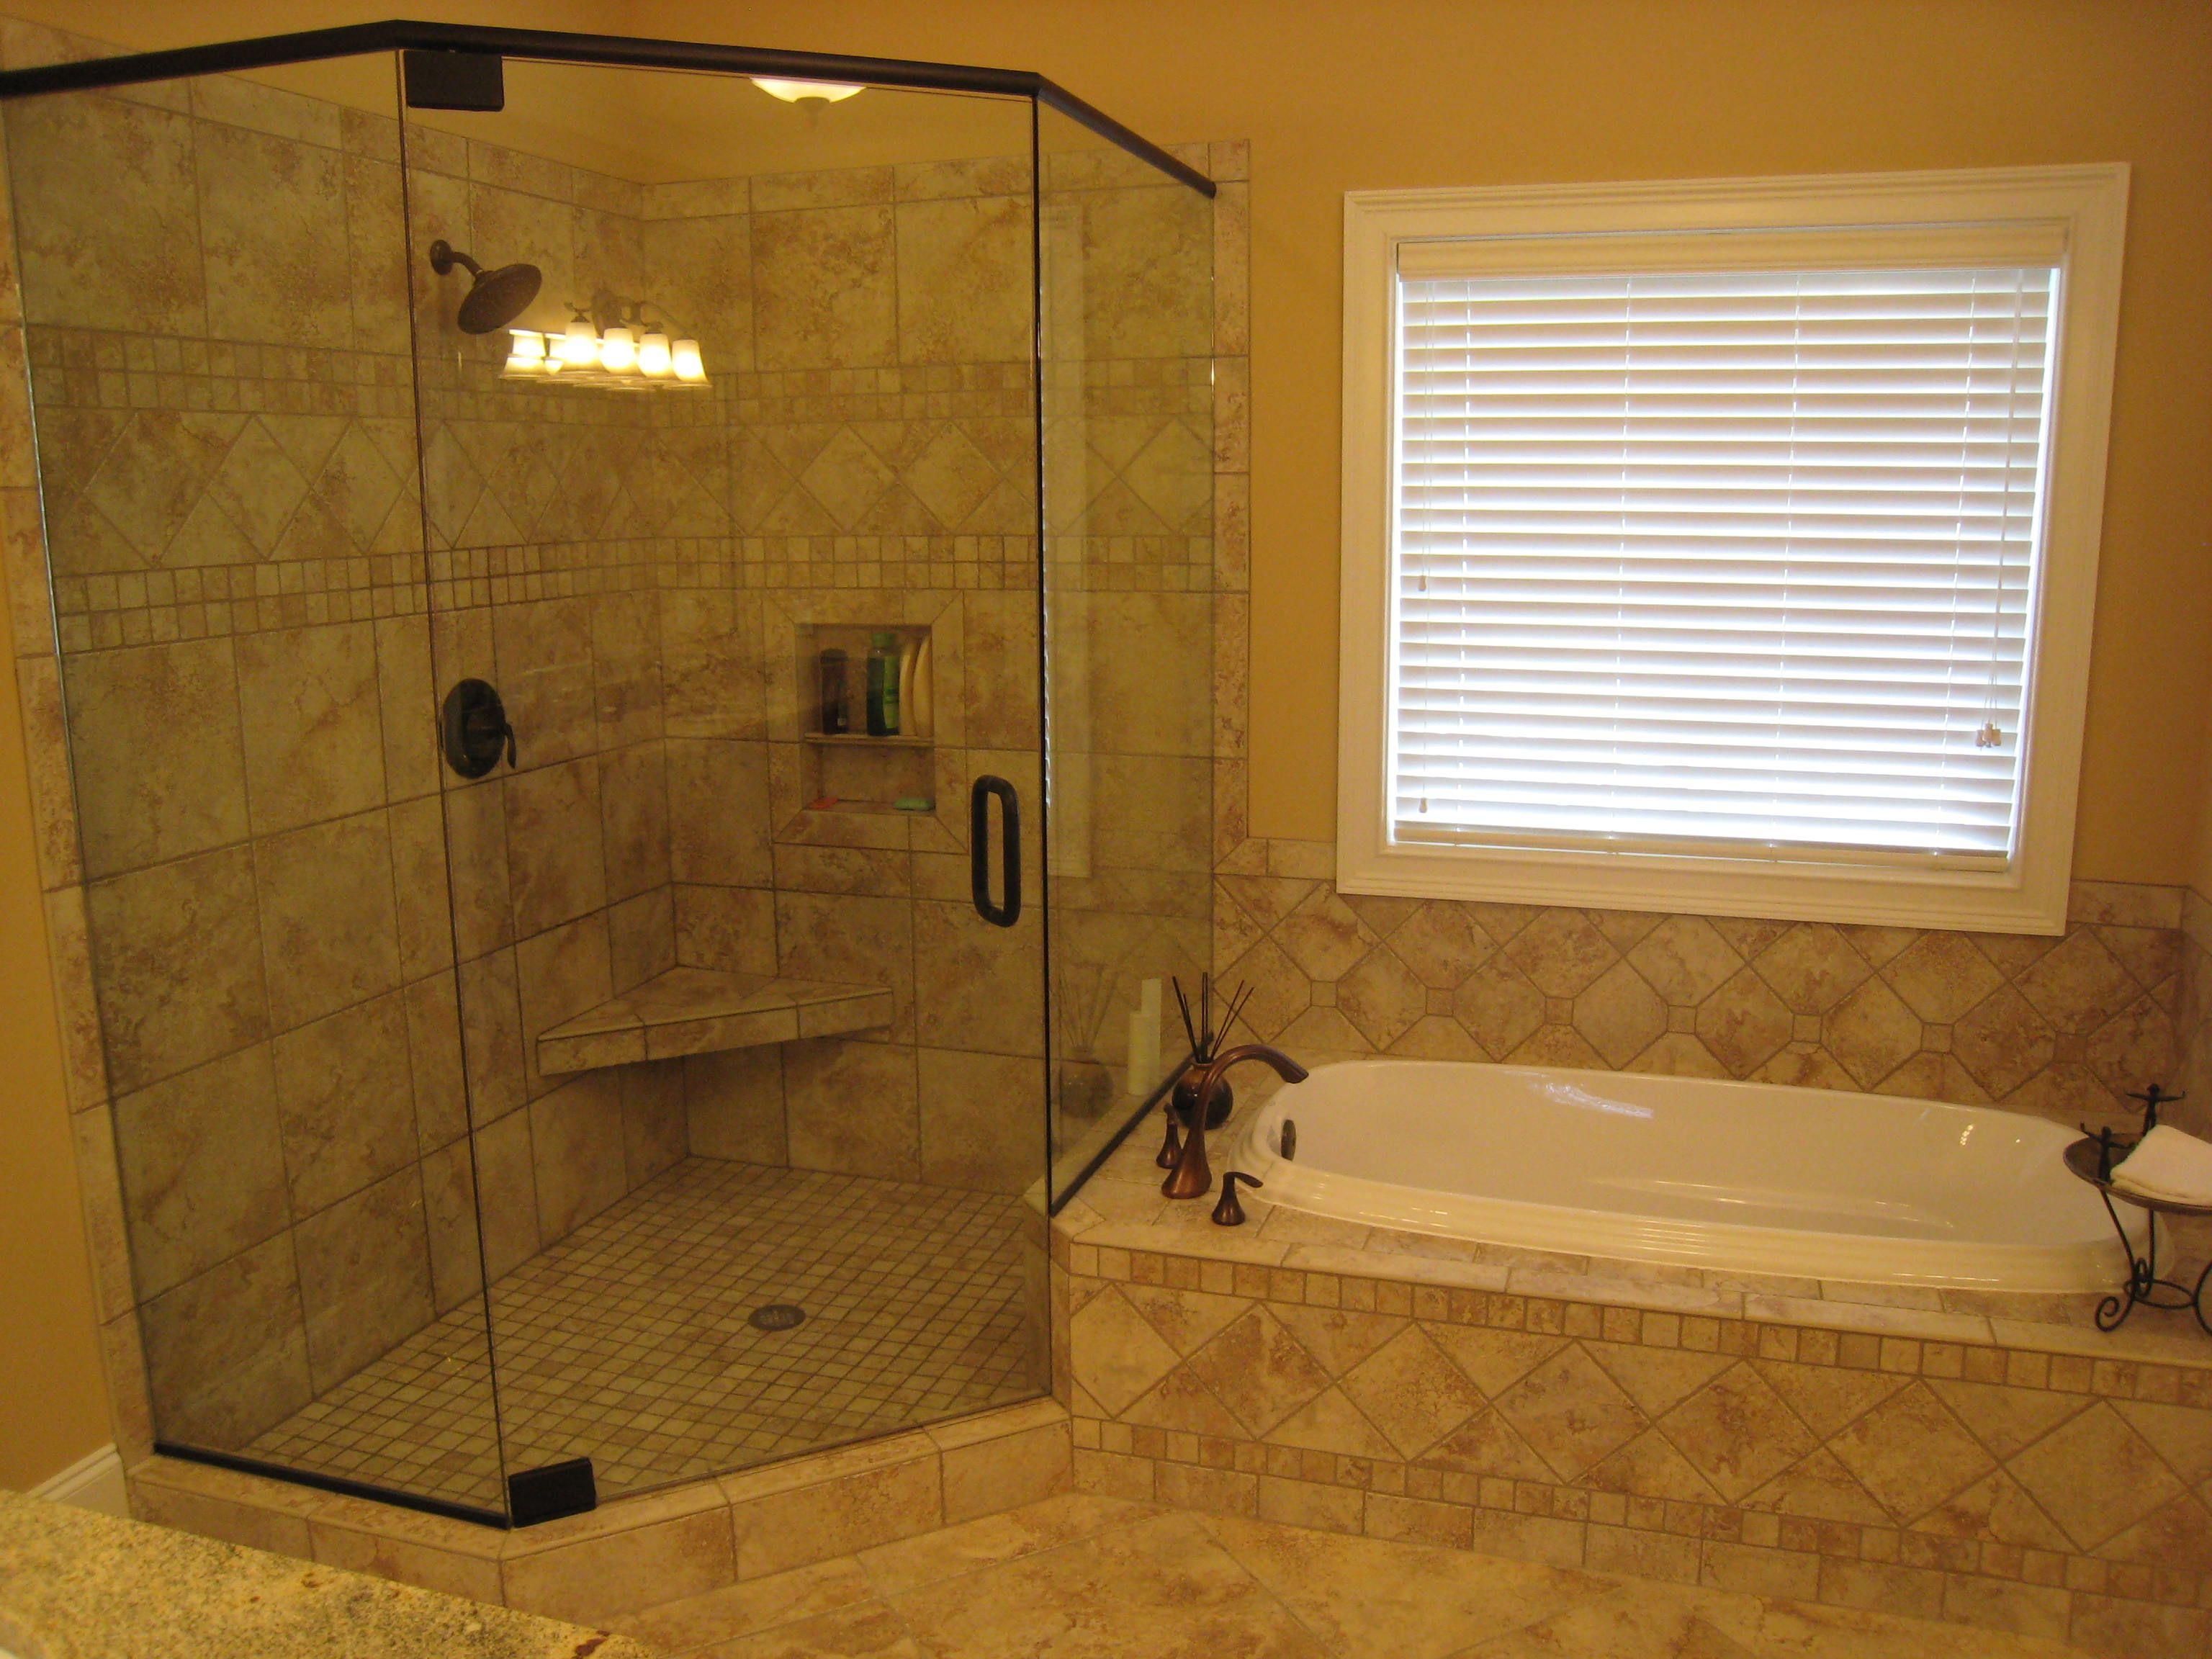 Small Affordable Master Bathroom Designs: Bathroom Renovation Designs